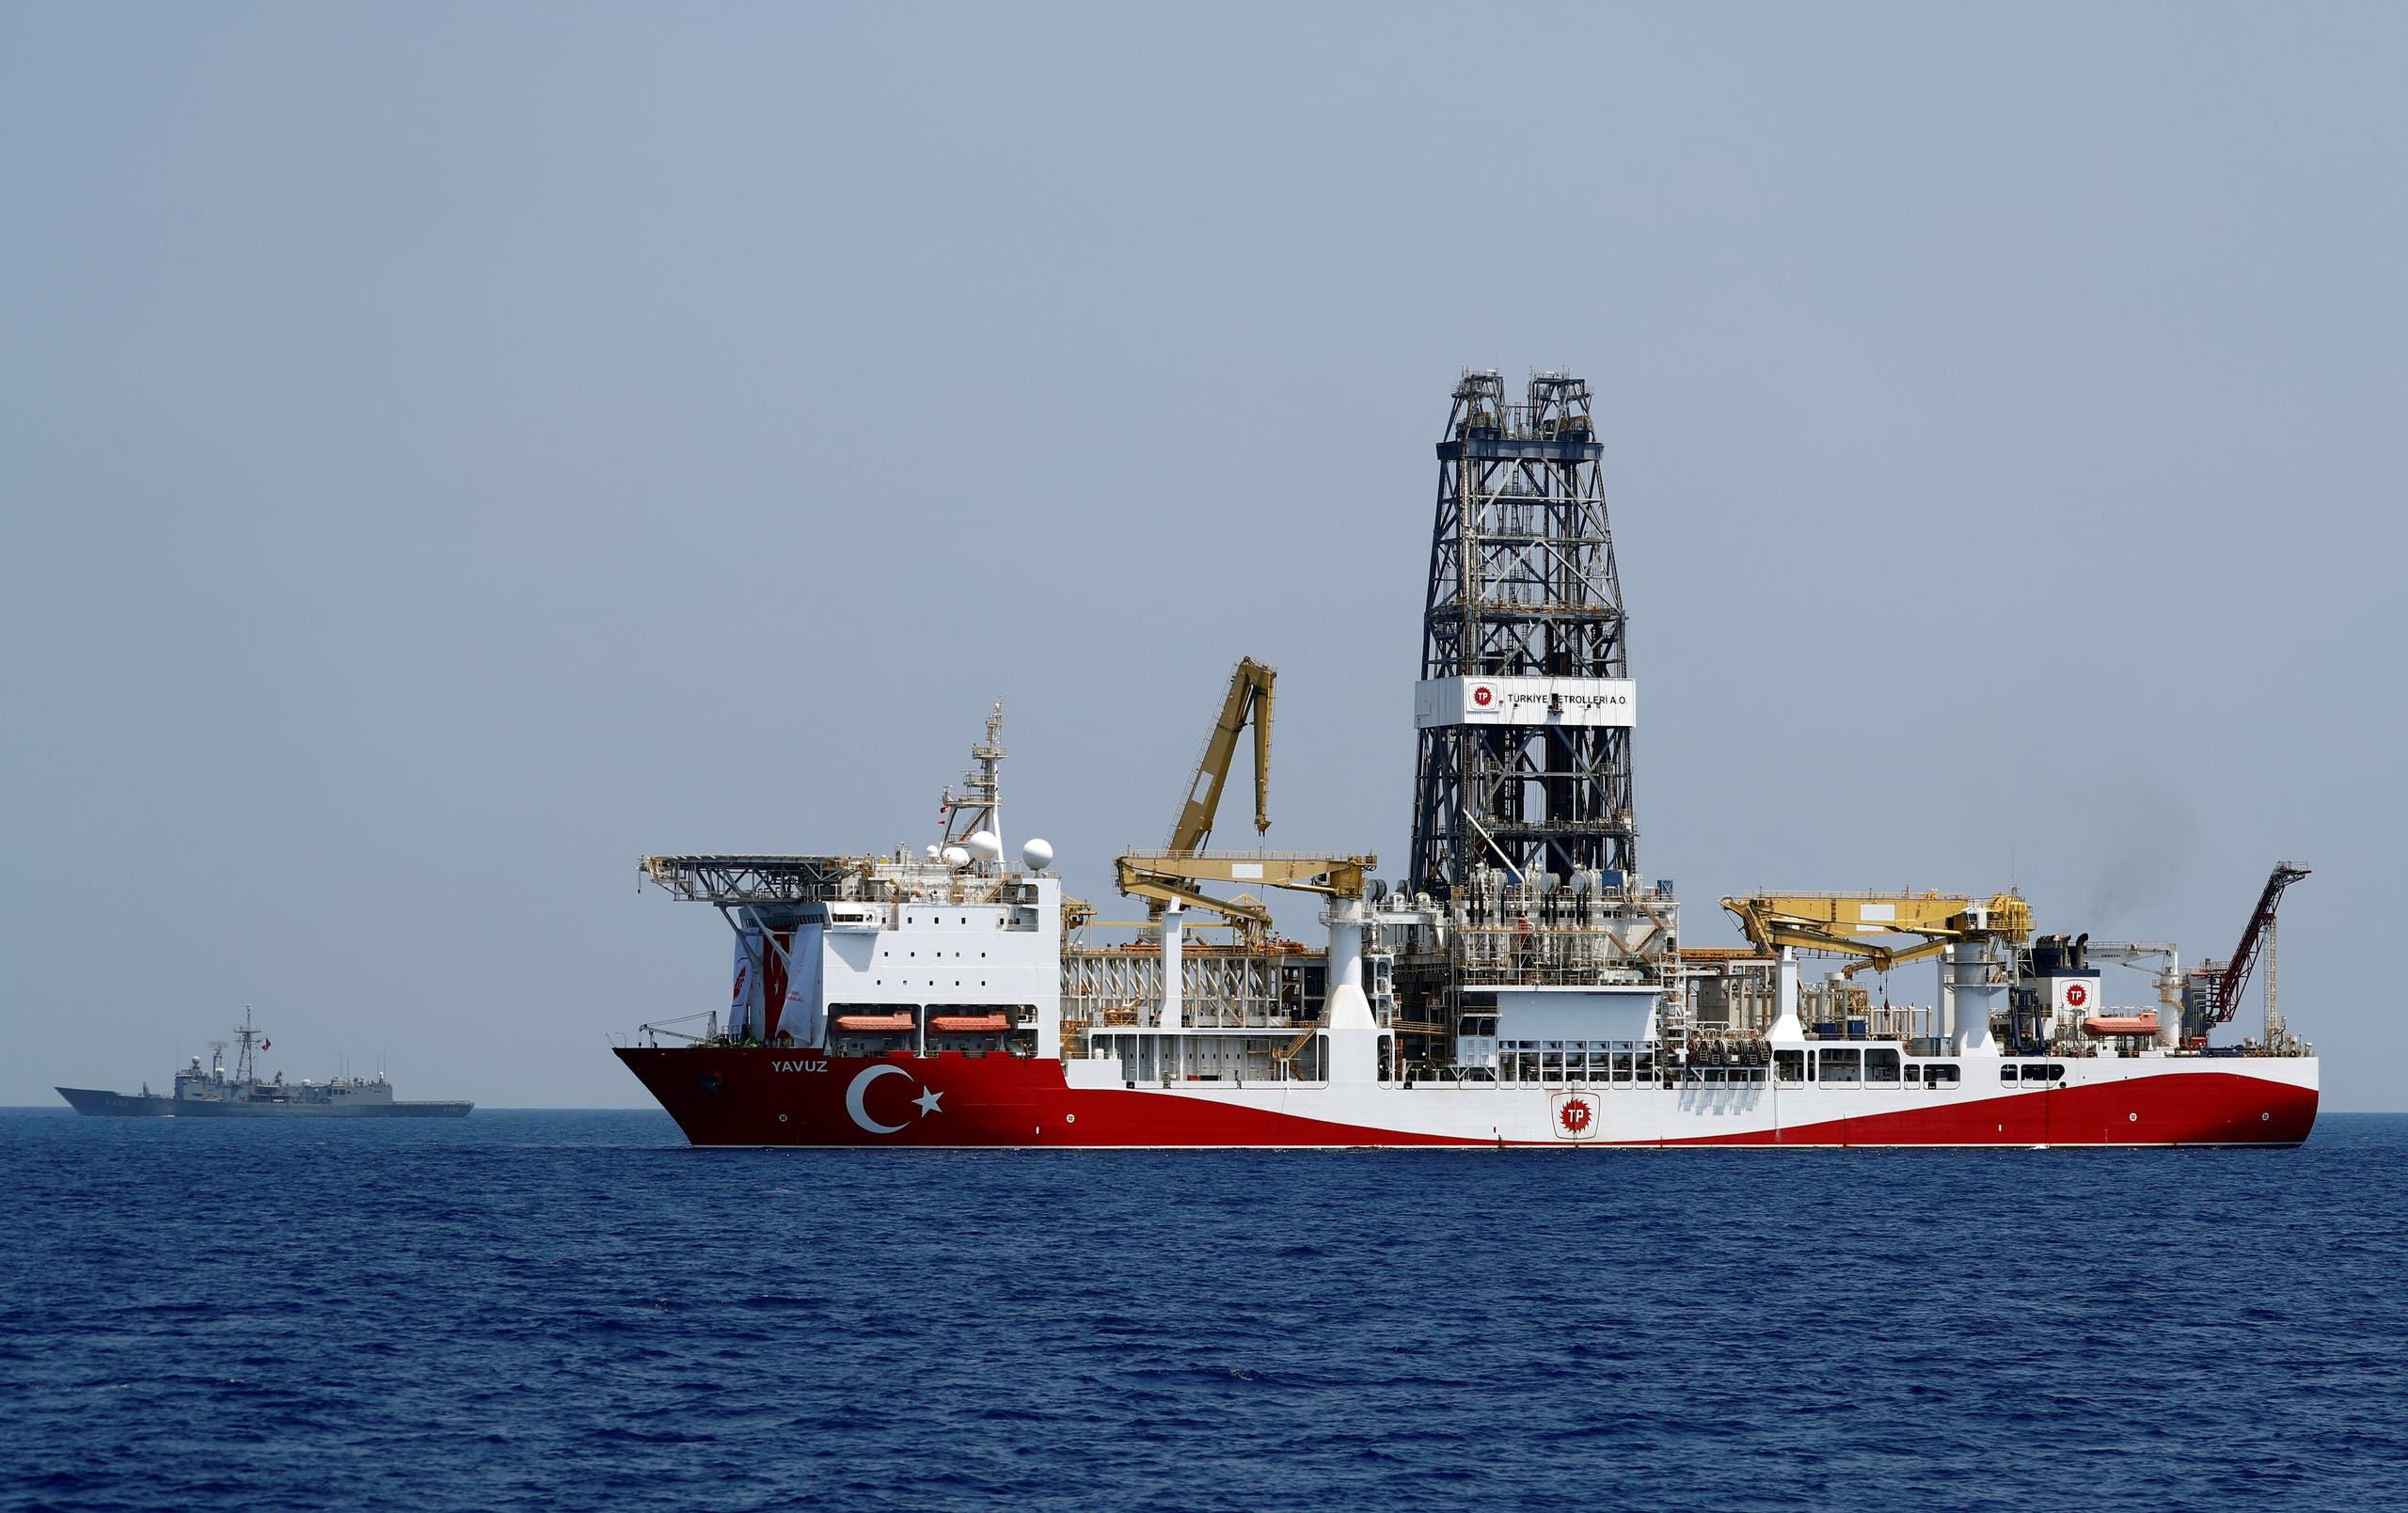 Turkish drilling vessel Yavuz is escorted by Turkish Navy frigate TCG Gemlik (F-492) in the eastern Mediterranean Sea off Cyprus, August 6, 2019. Picture taken August 6, 2019. (File photo: Reuters)